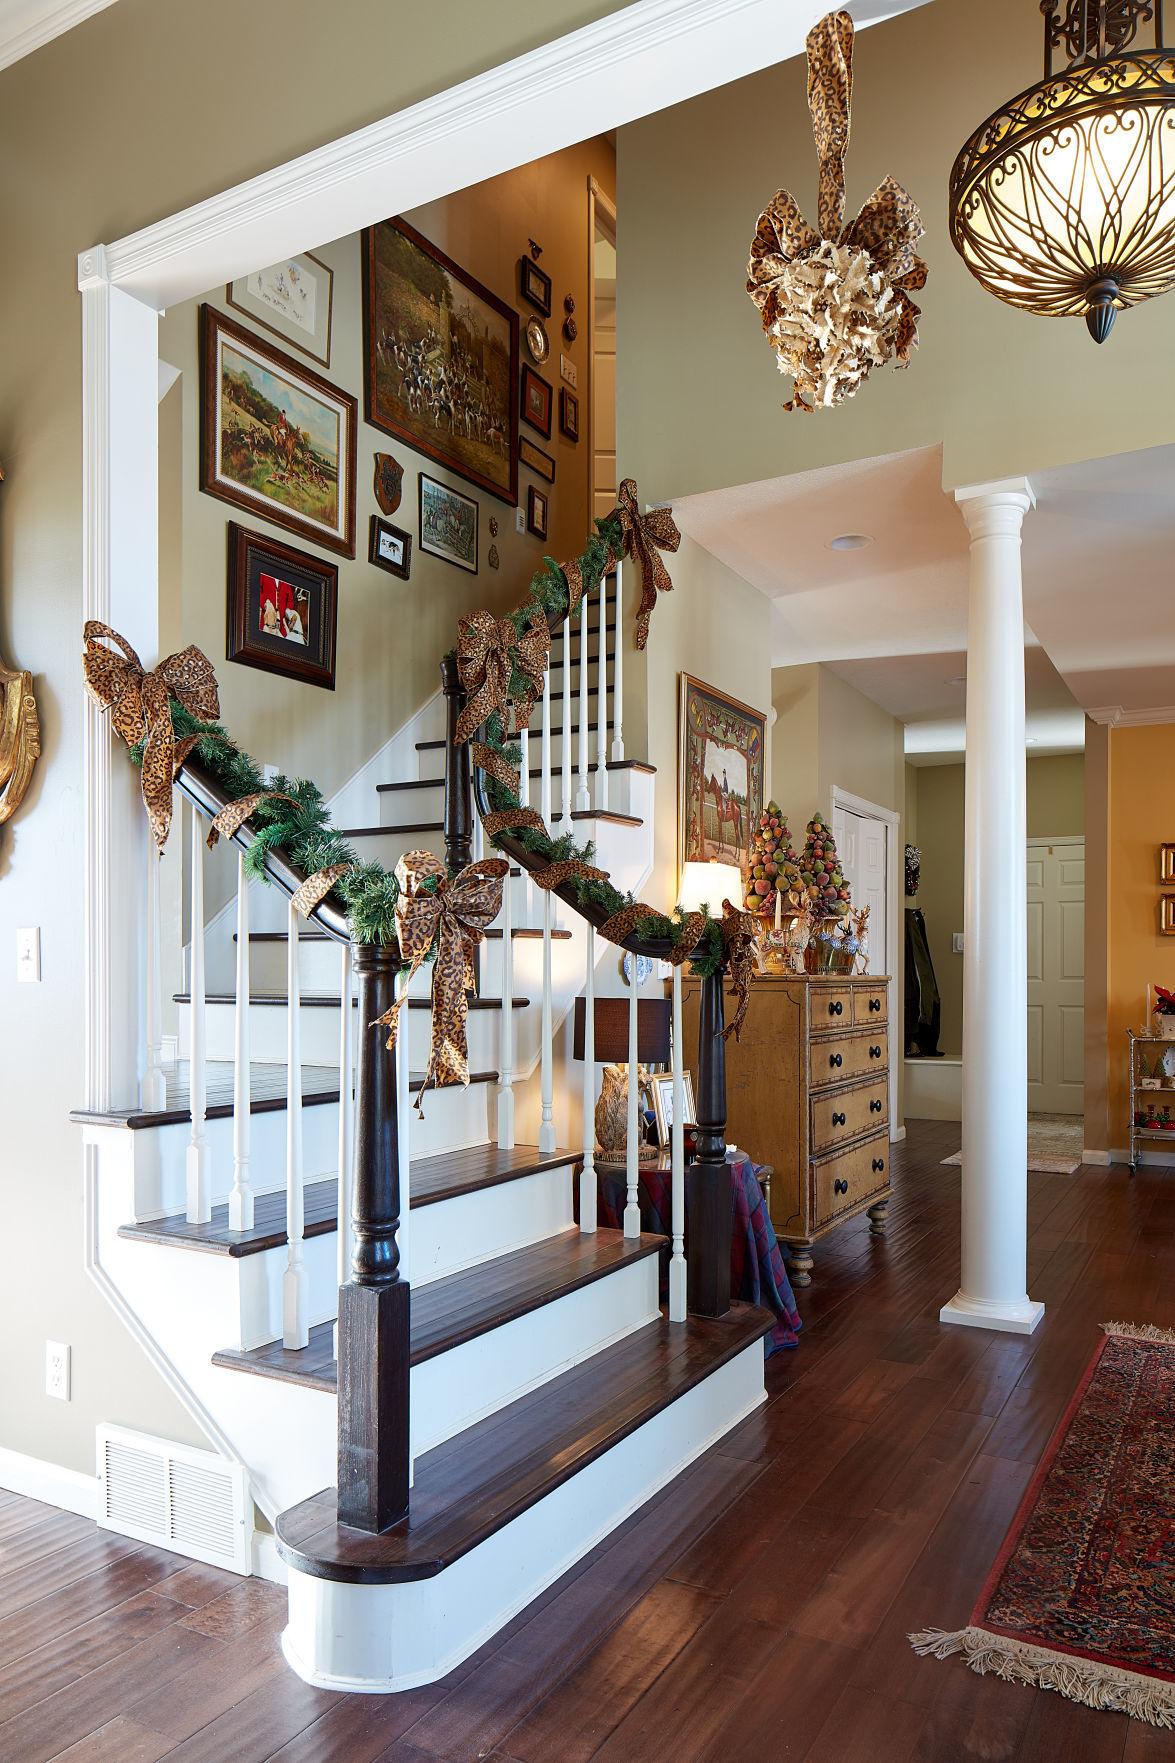 Toebben stairs